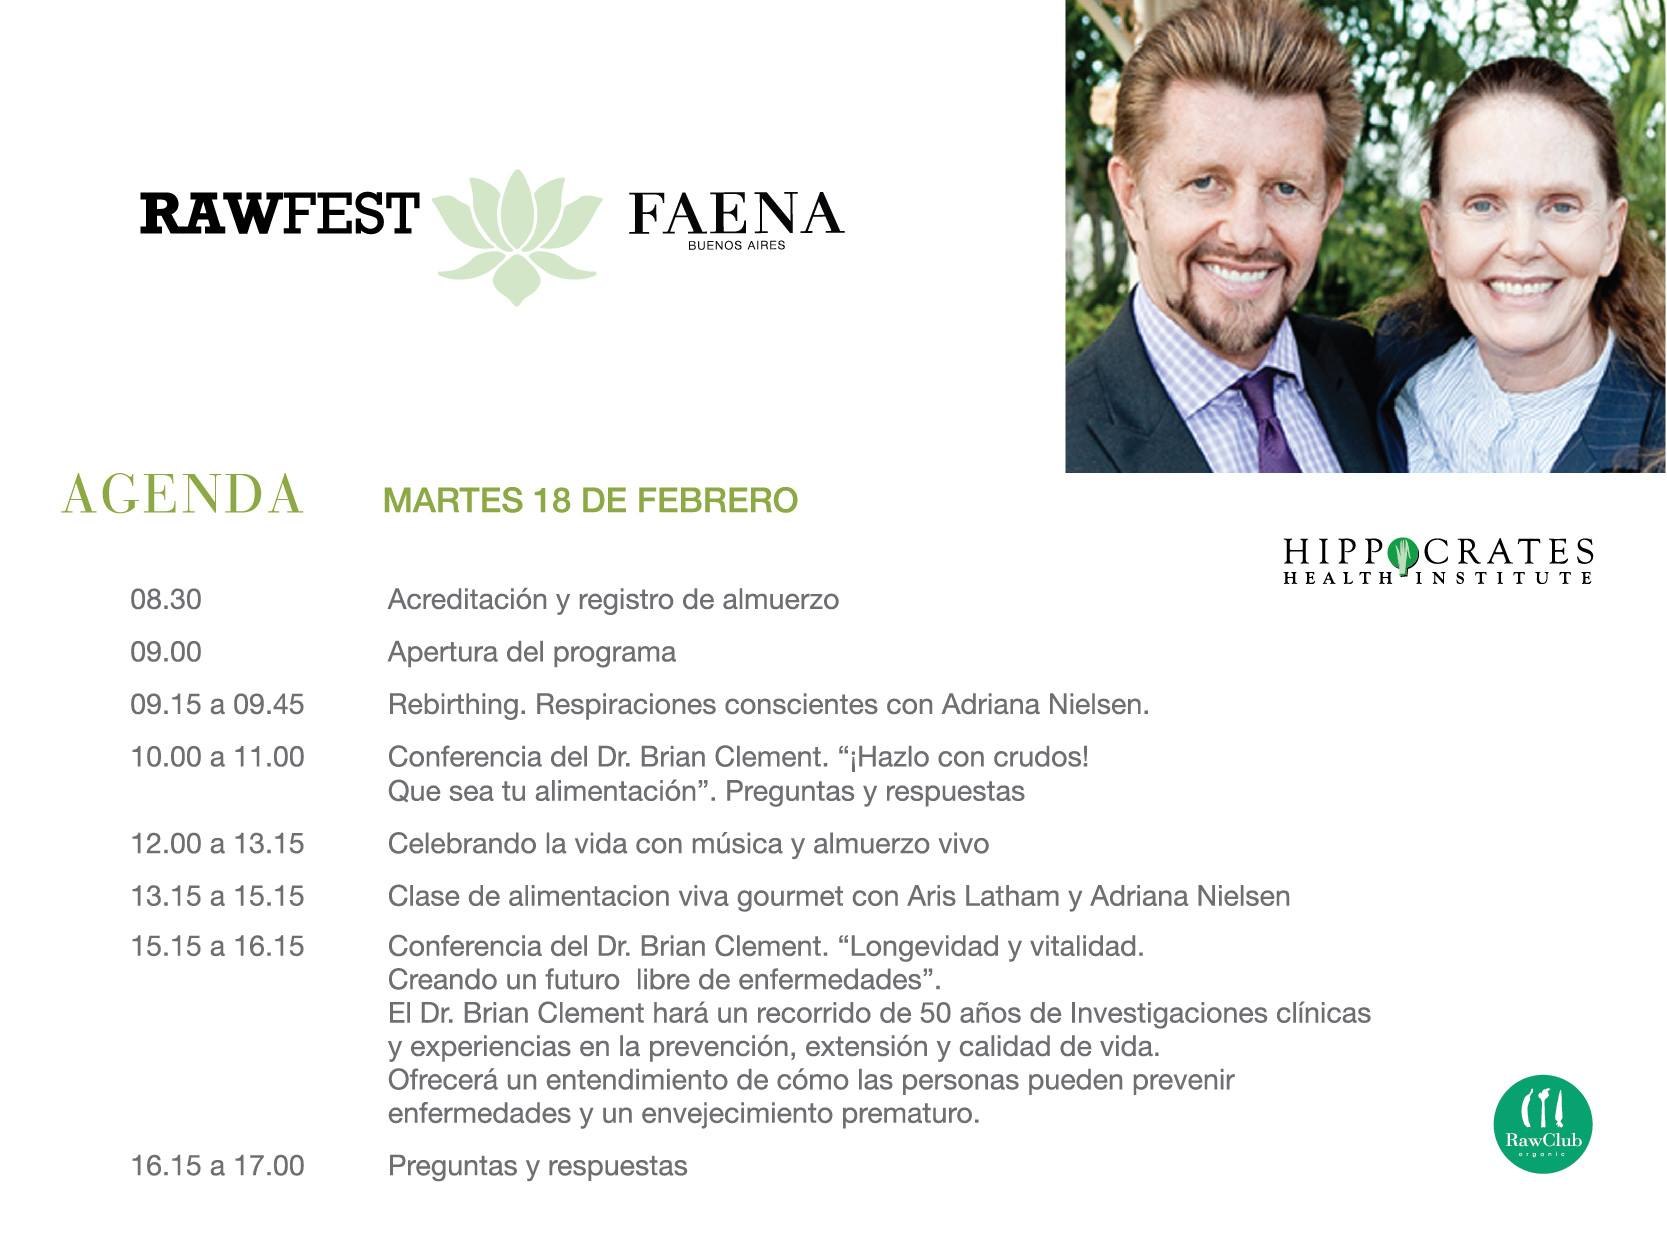 rawfest - martes